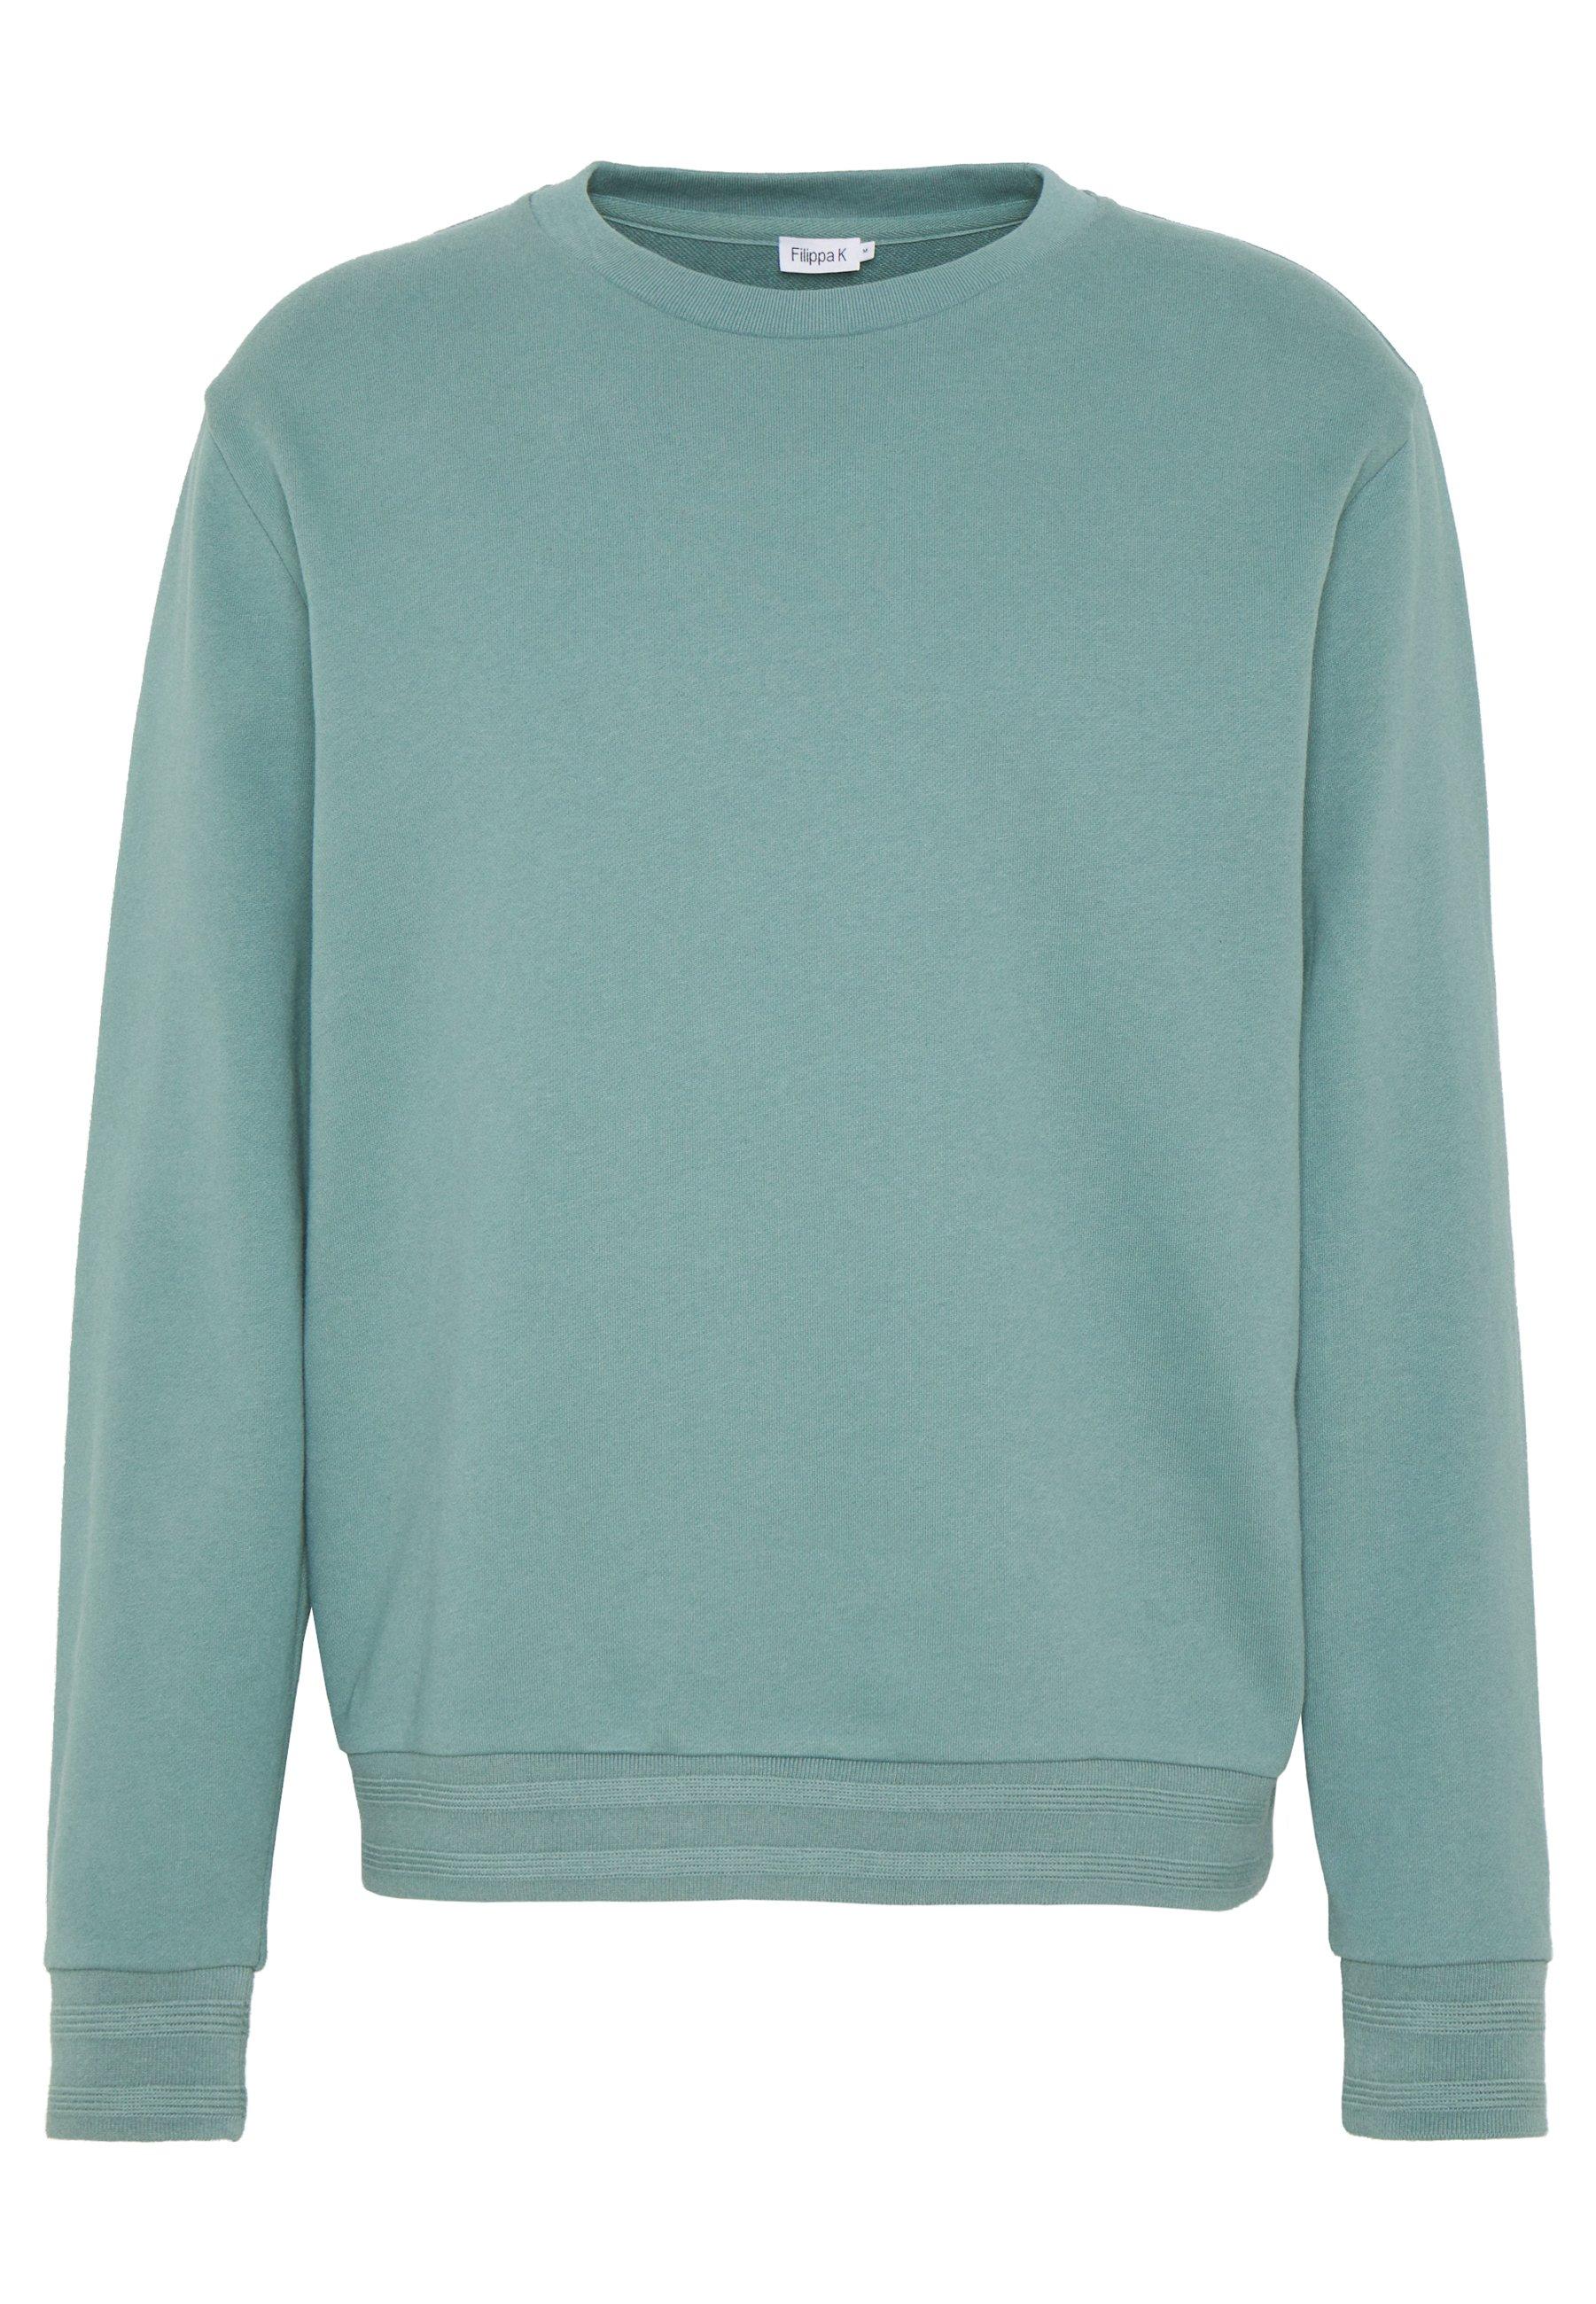 mint green and grey nike sweatshirt